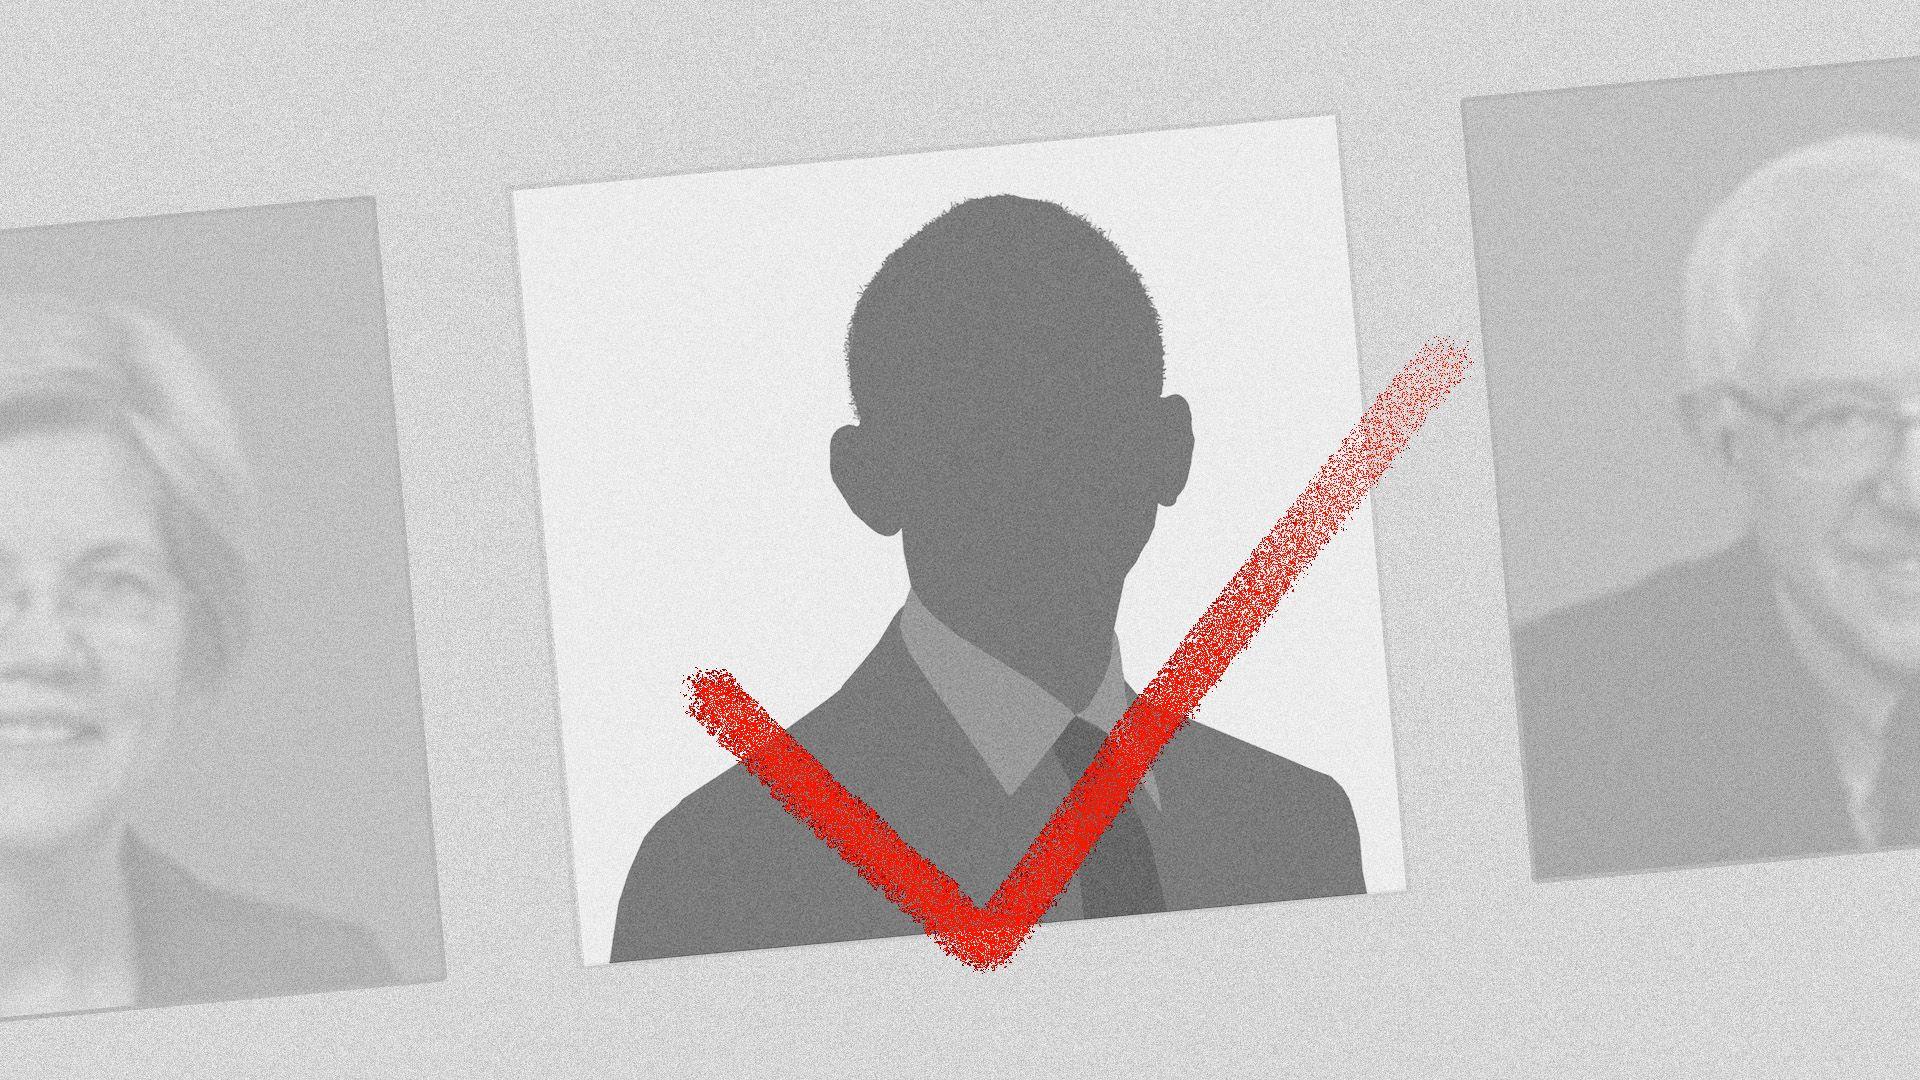 Ohio swing voters crave Obama